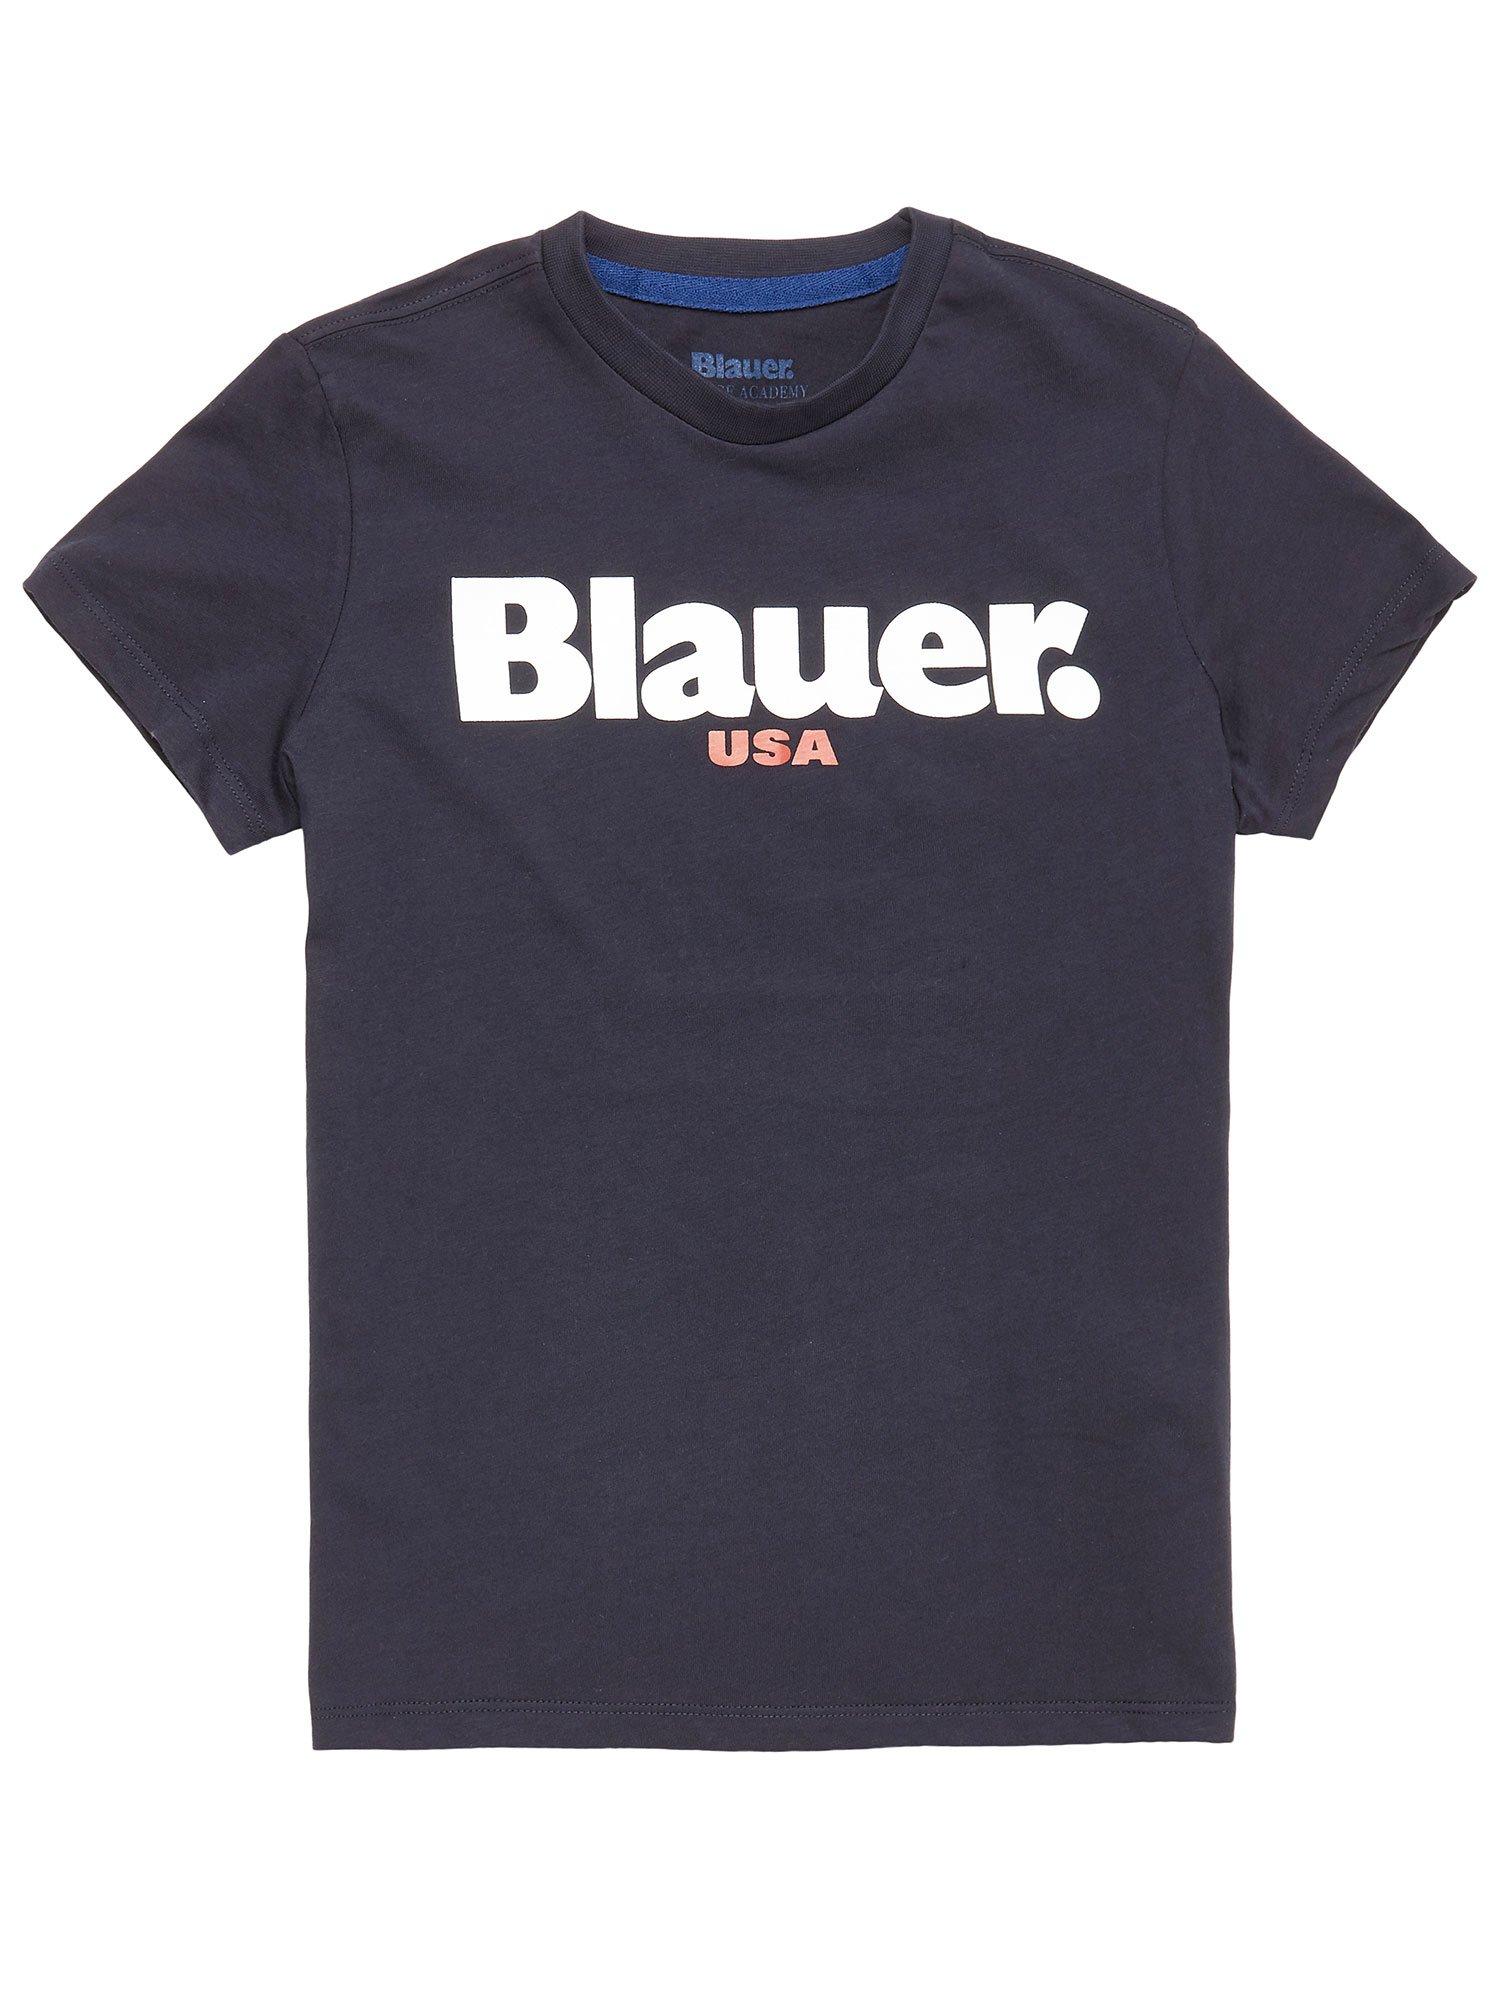 T-SHIRT BAMBINO BLAUER USA - Blu Notte Scura - Blauer